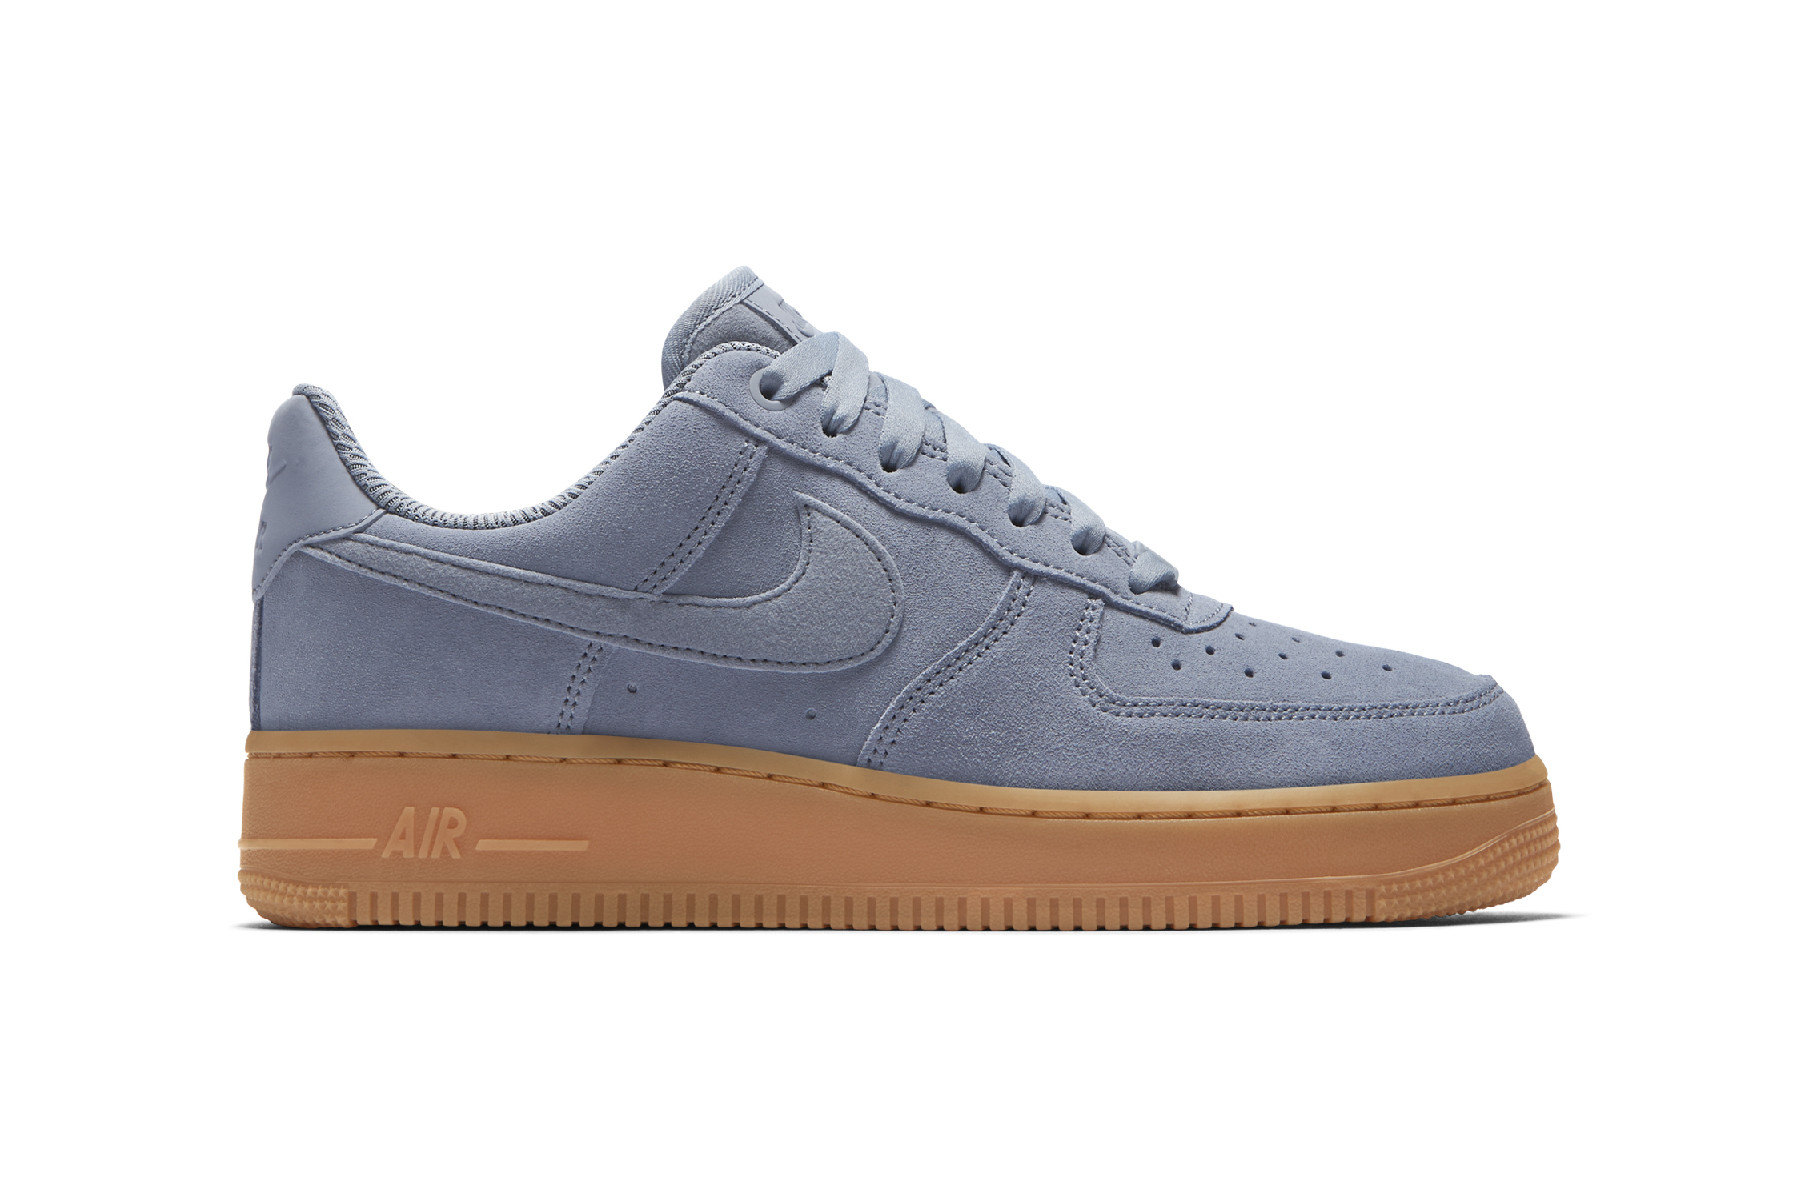 Glacier Blue Air Force 1 Sneaker